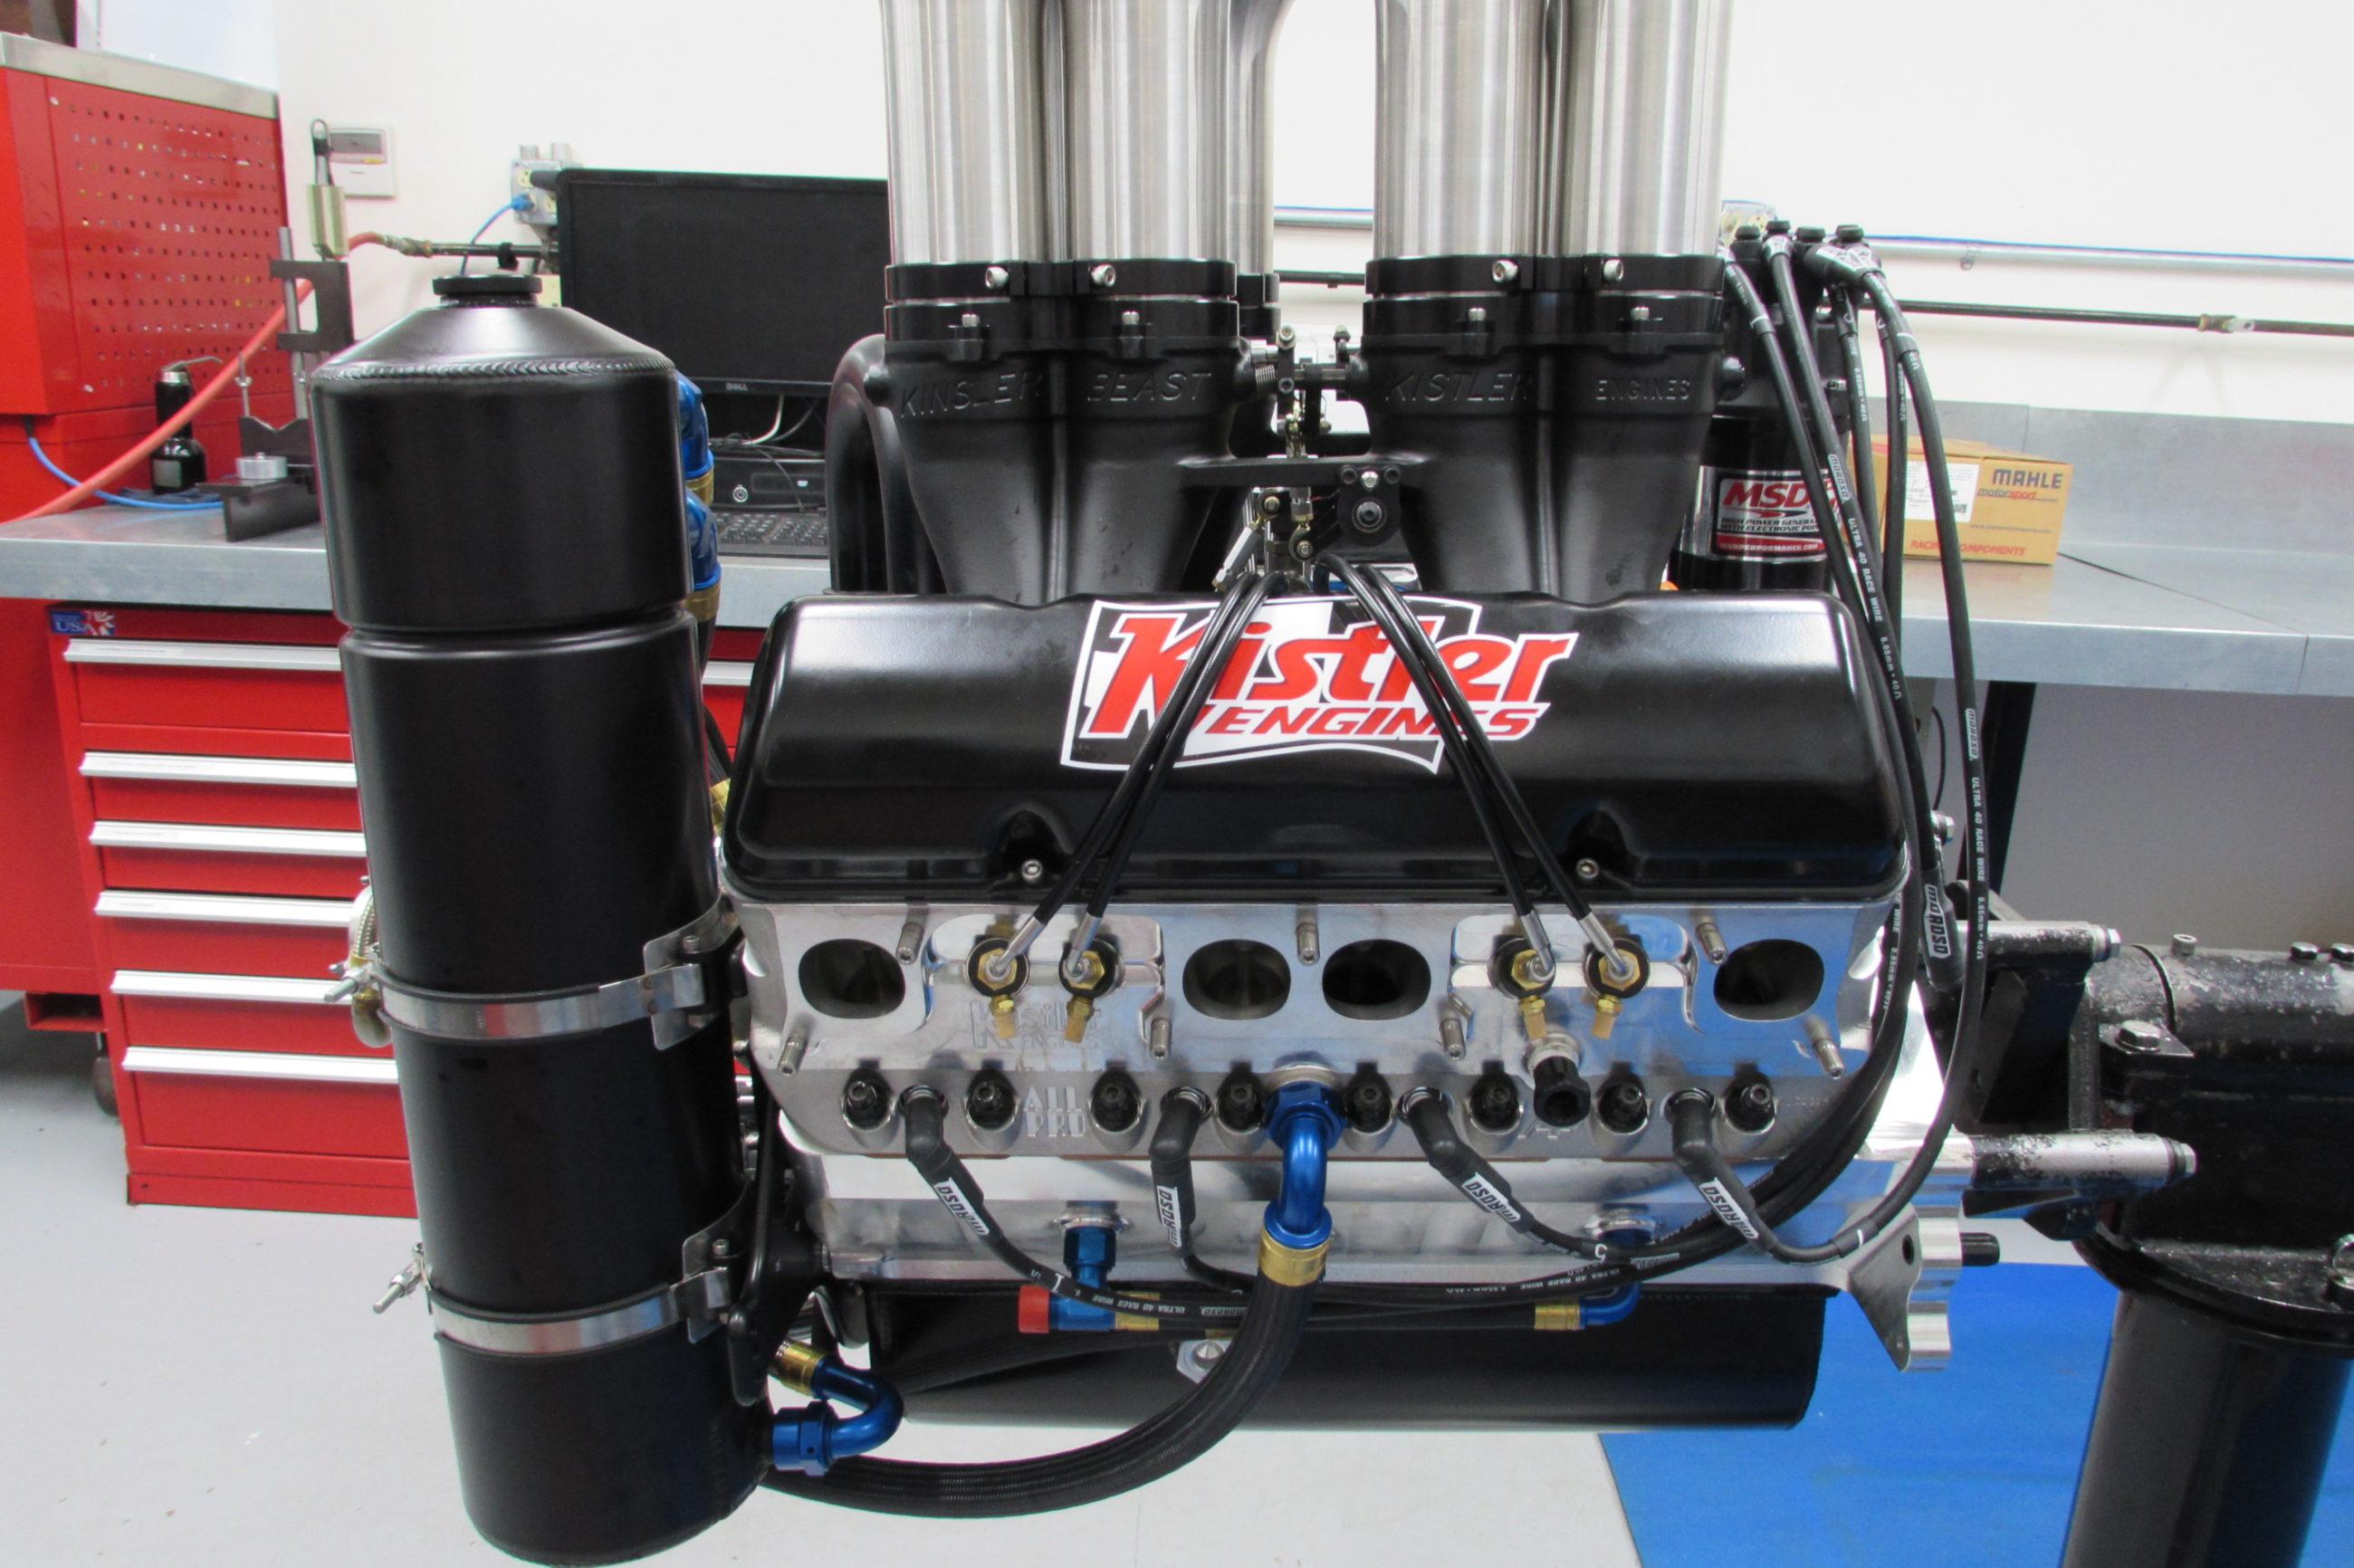 410 Sprint Car Engine - Dirt Racing Engine Builder - Kistler